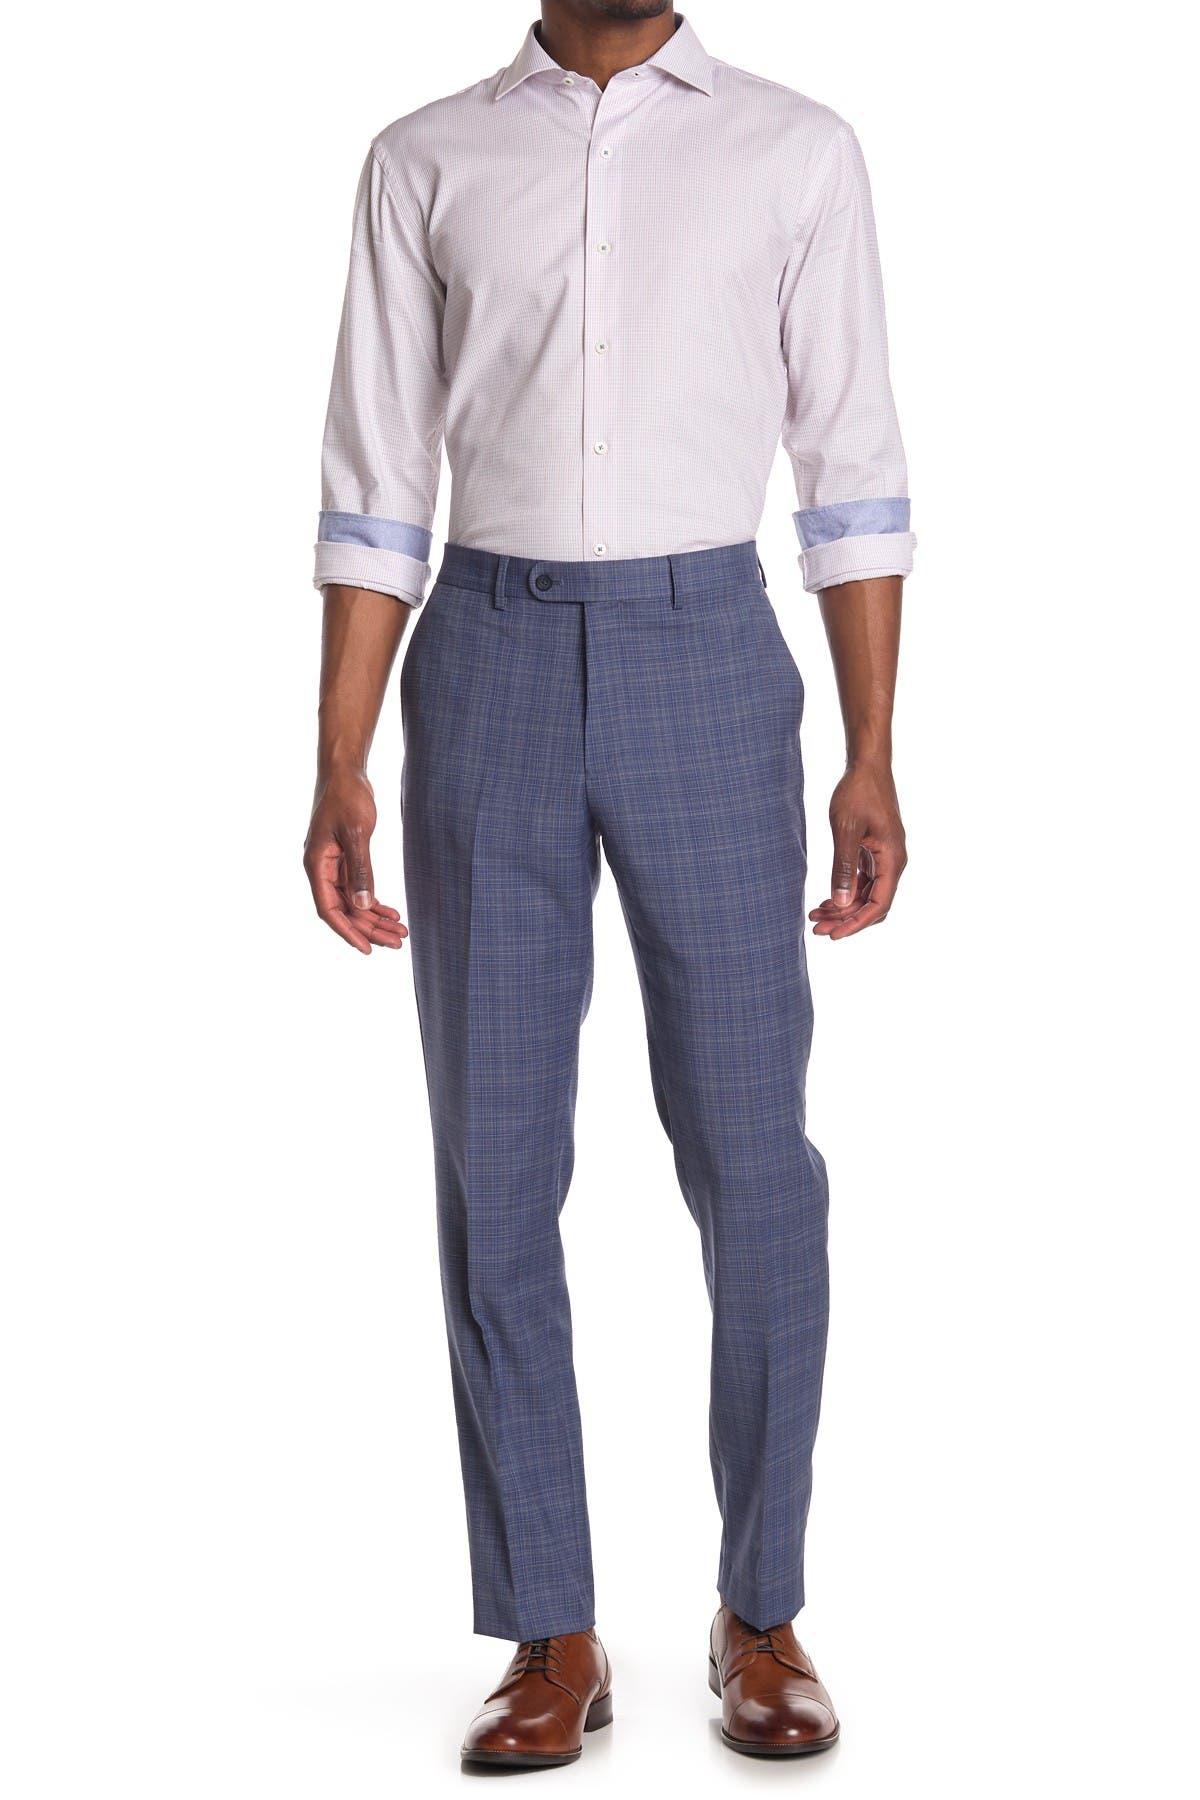 Original Penguin Mens Suit Pant Wool Blend Separates